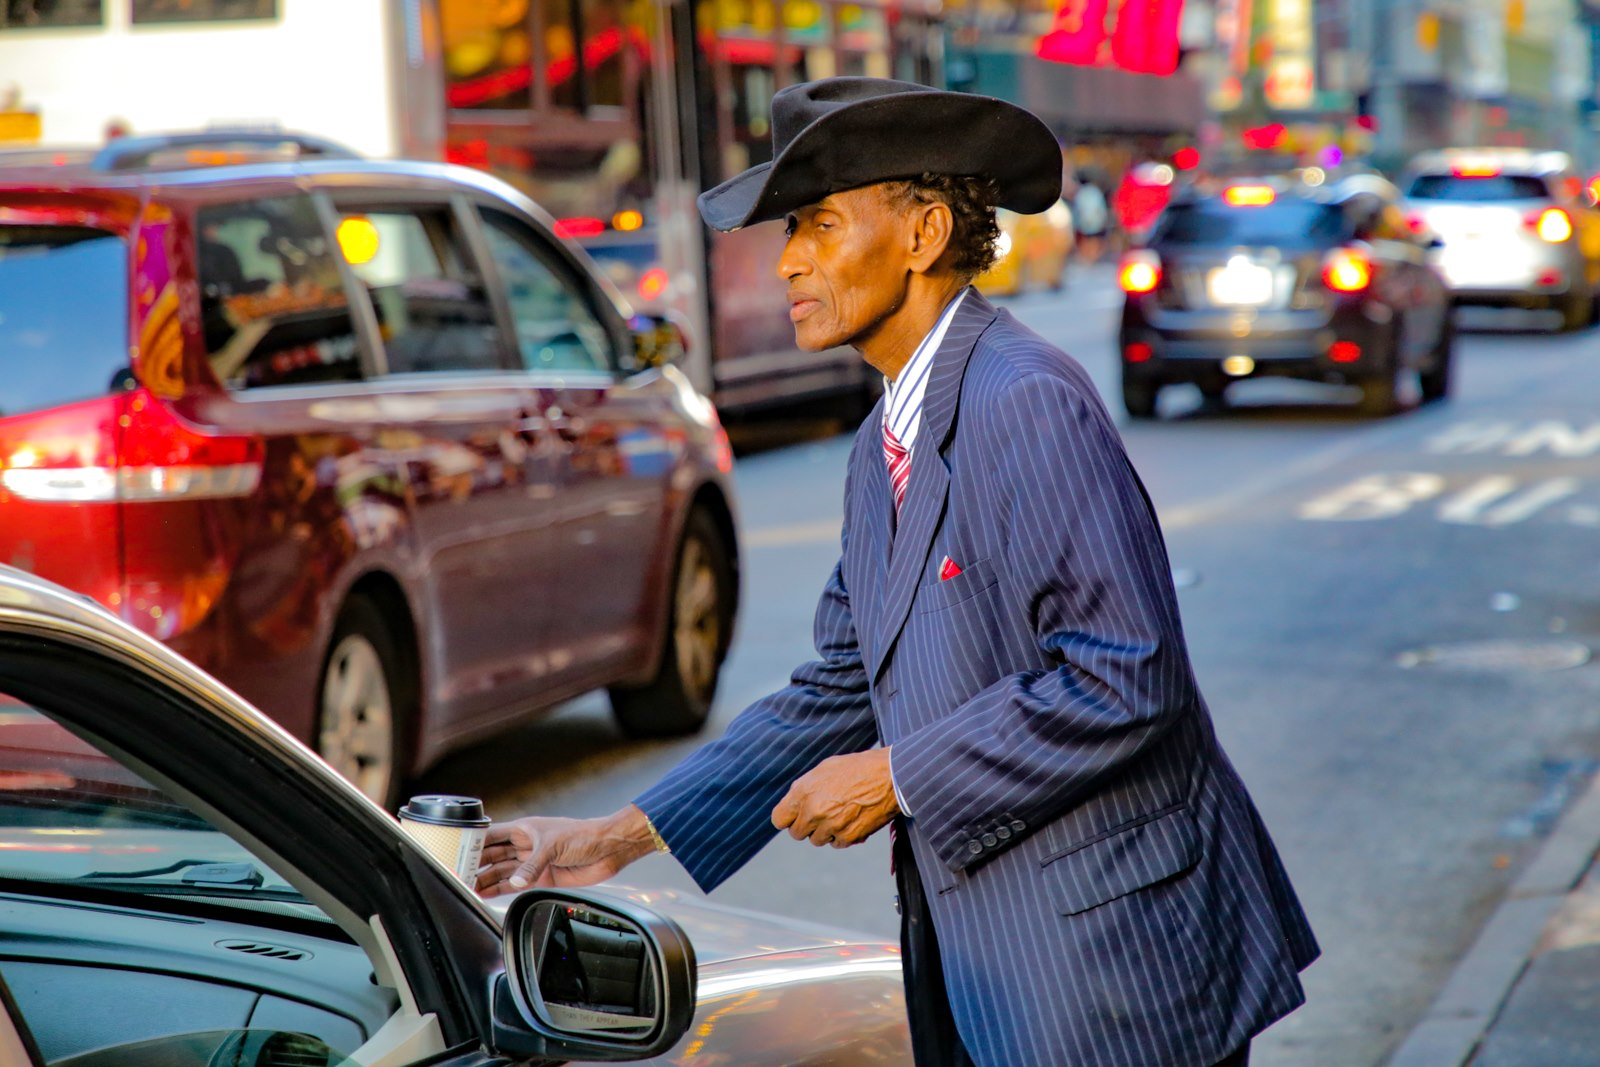 Kovboj s 42-j ulicy. On ese ezdit na staroj policejskoj Kraun-Viktorii.